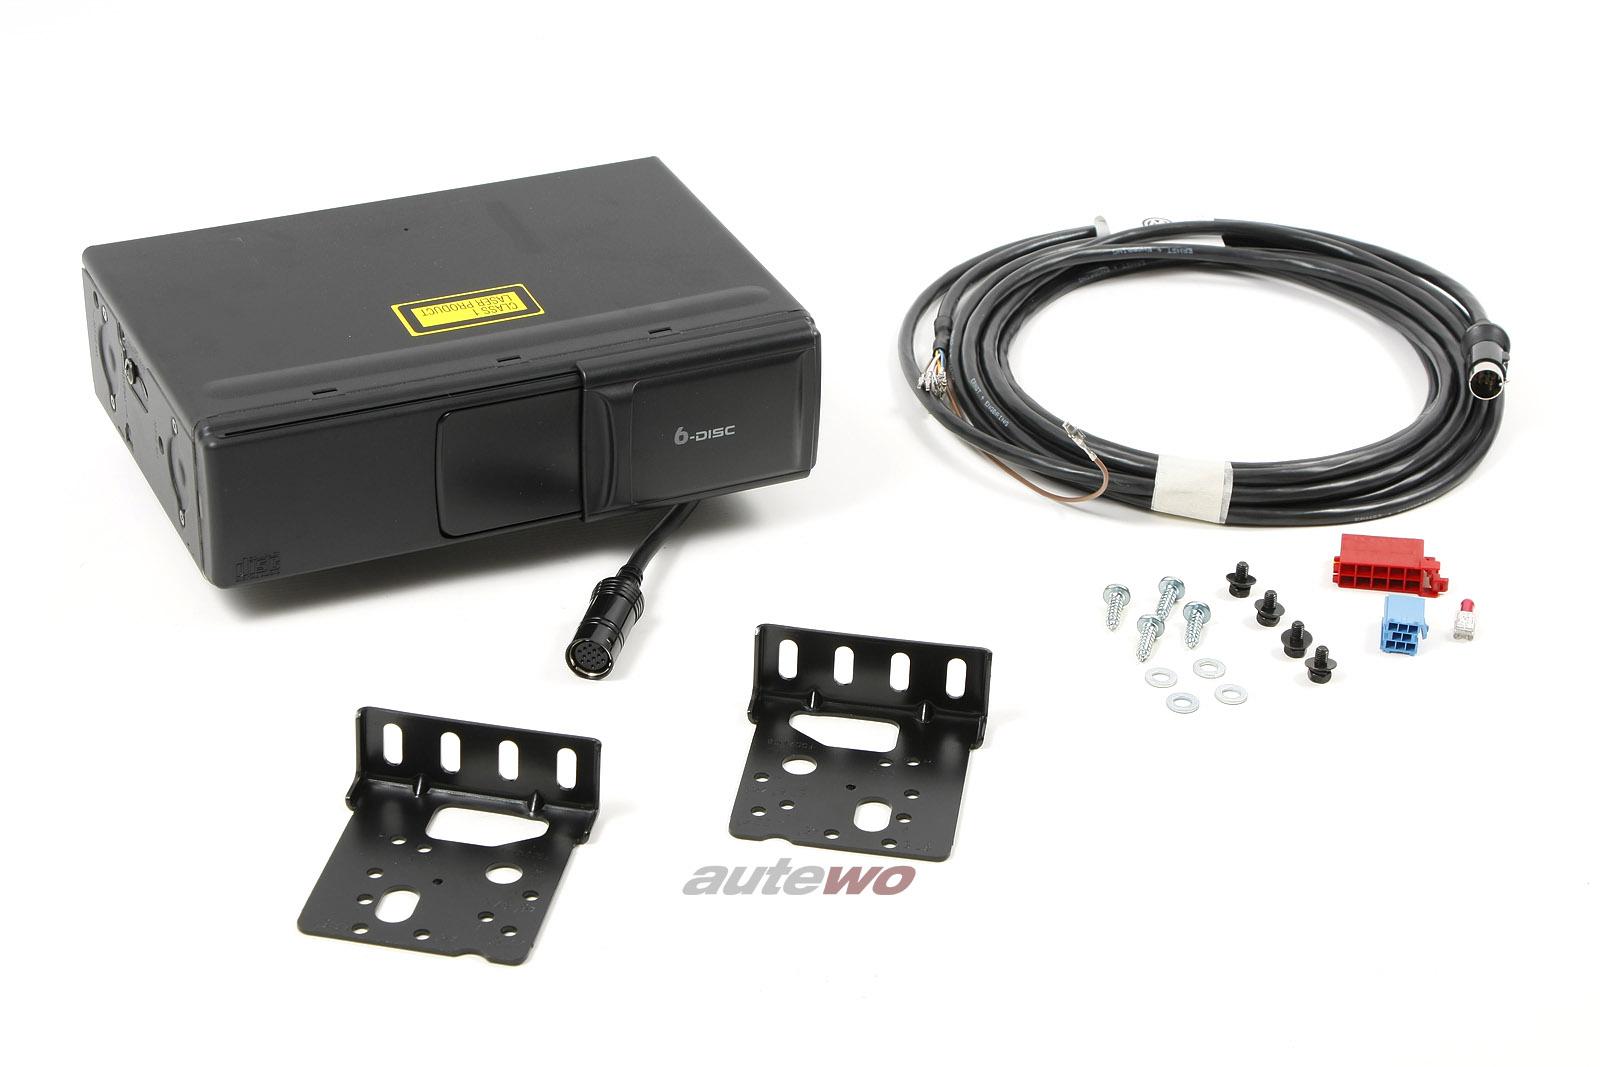 4B0057111A 4B0035111A NEU Audi A3 8L/A4 B5/A6 4B/A8 D2 CD-Wechsler + Montageset